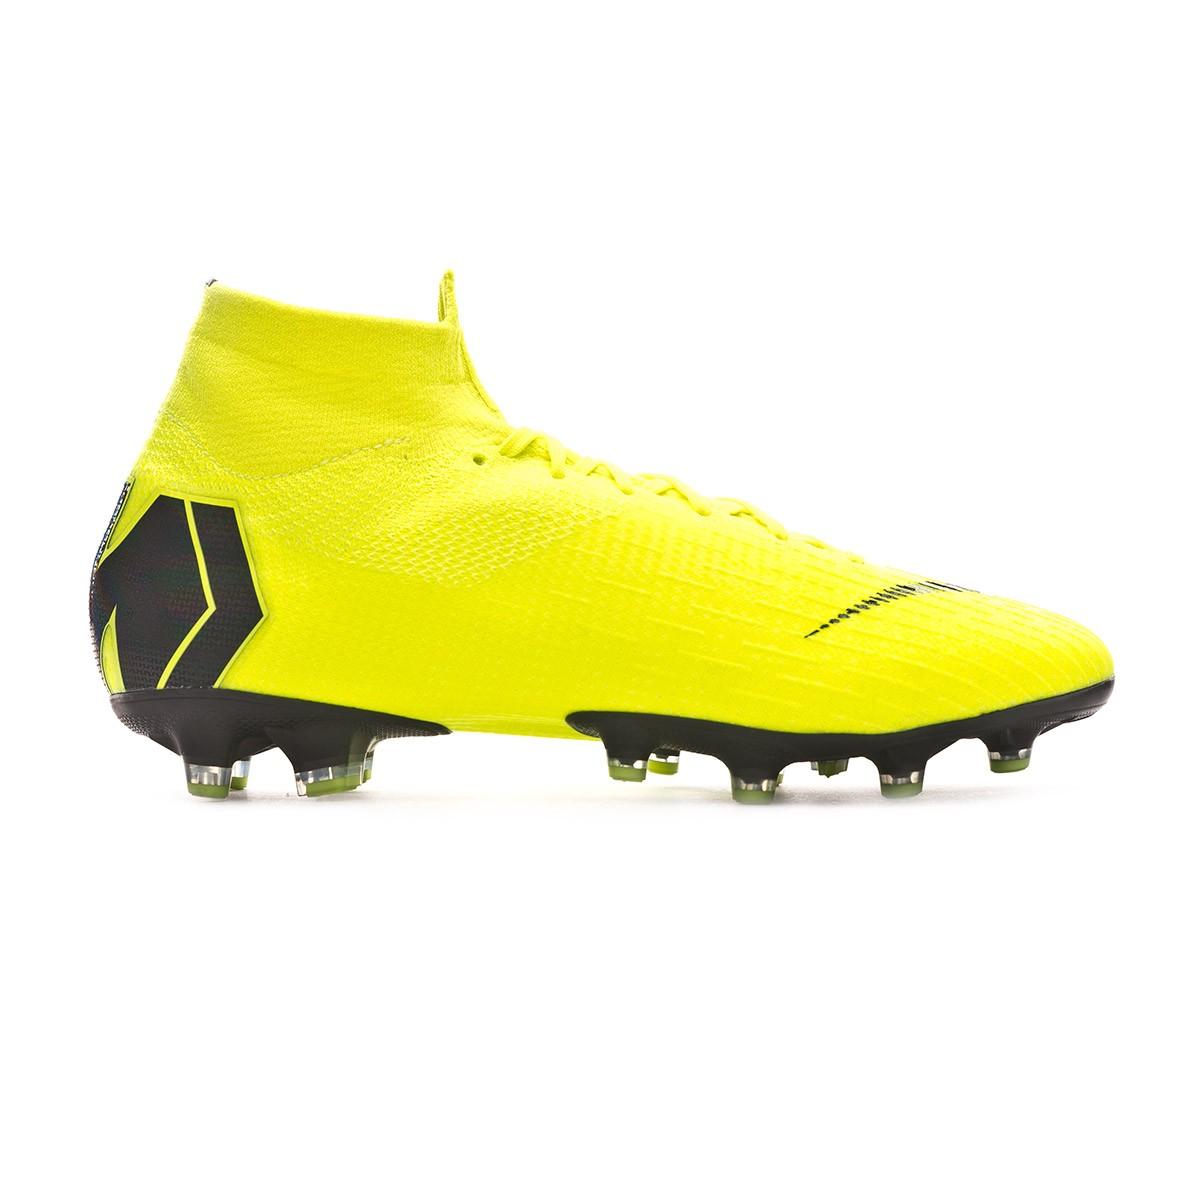 d40d96efe90 Football Boots Nike Mercurial Superfly VI Elite AG-Pro Volt-Black - Football  store Fútbol Emotion